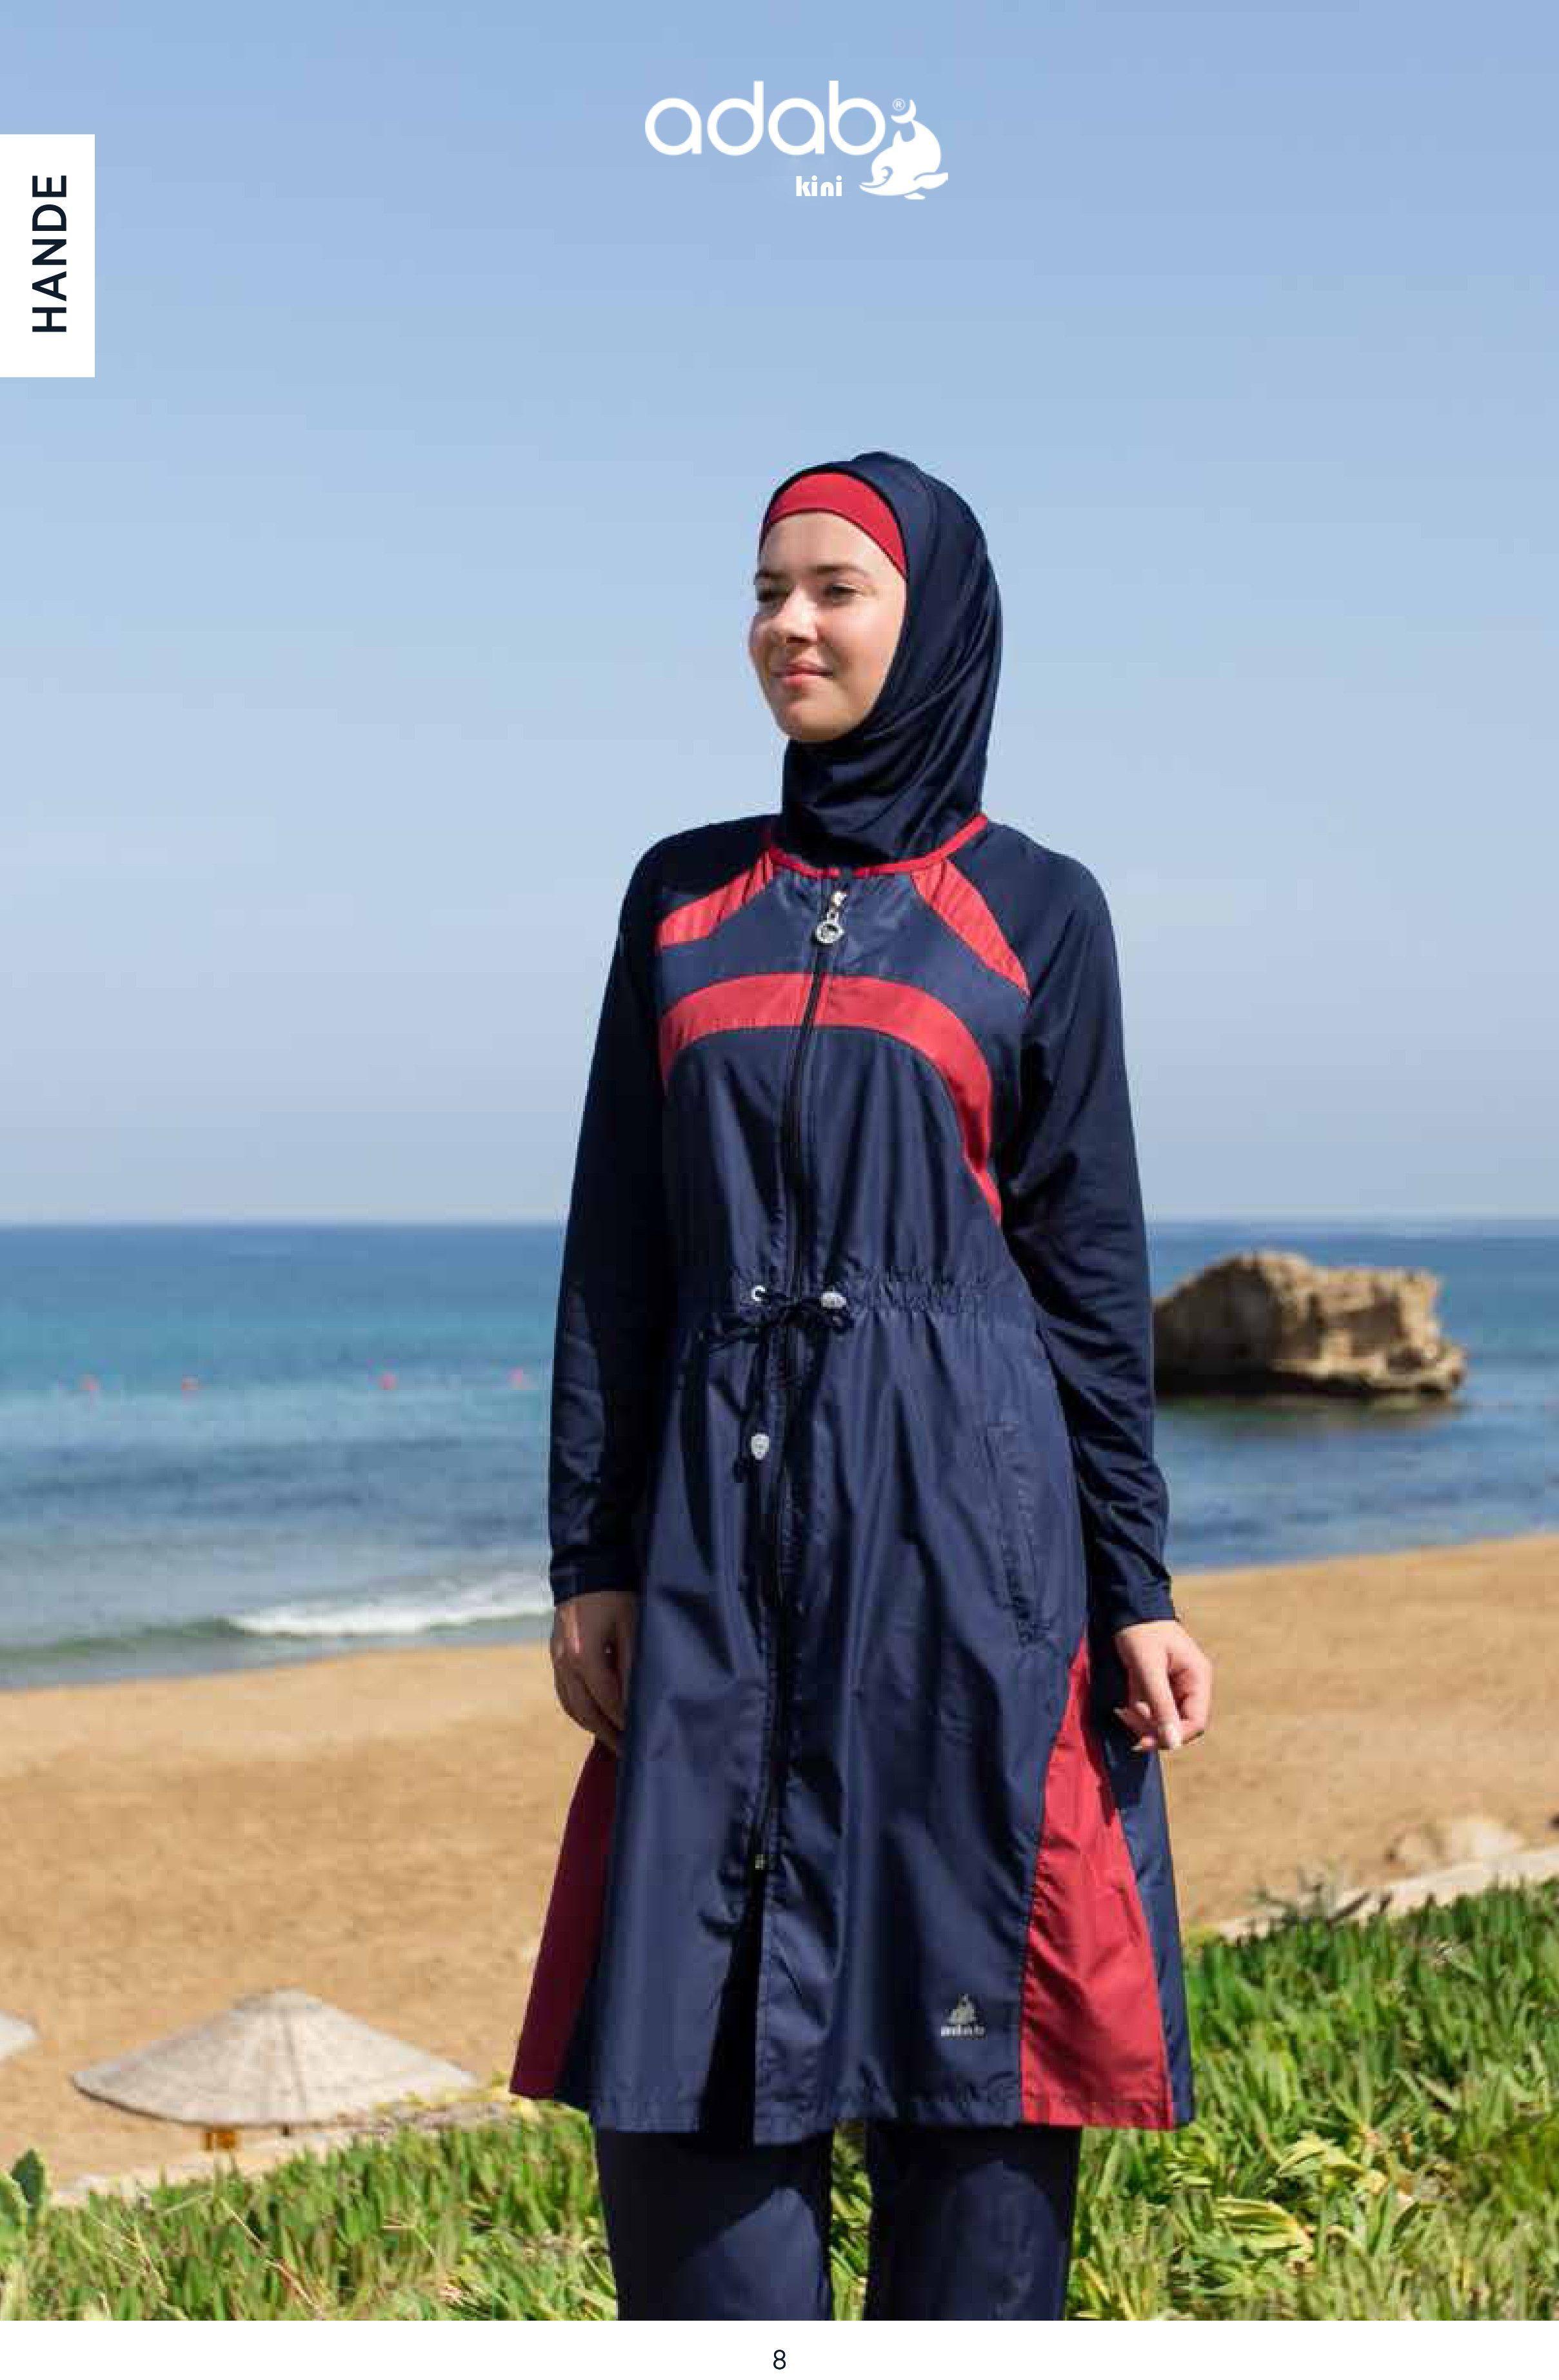 af8c2b8db39d1 Adabkini HANDE Women's Swimsuit Full Cover Hijab Burkini Islamic, Hindu,  Arab, Jewish Swimwear